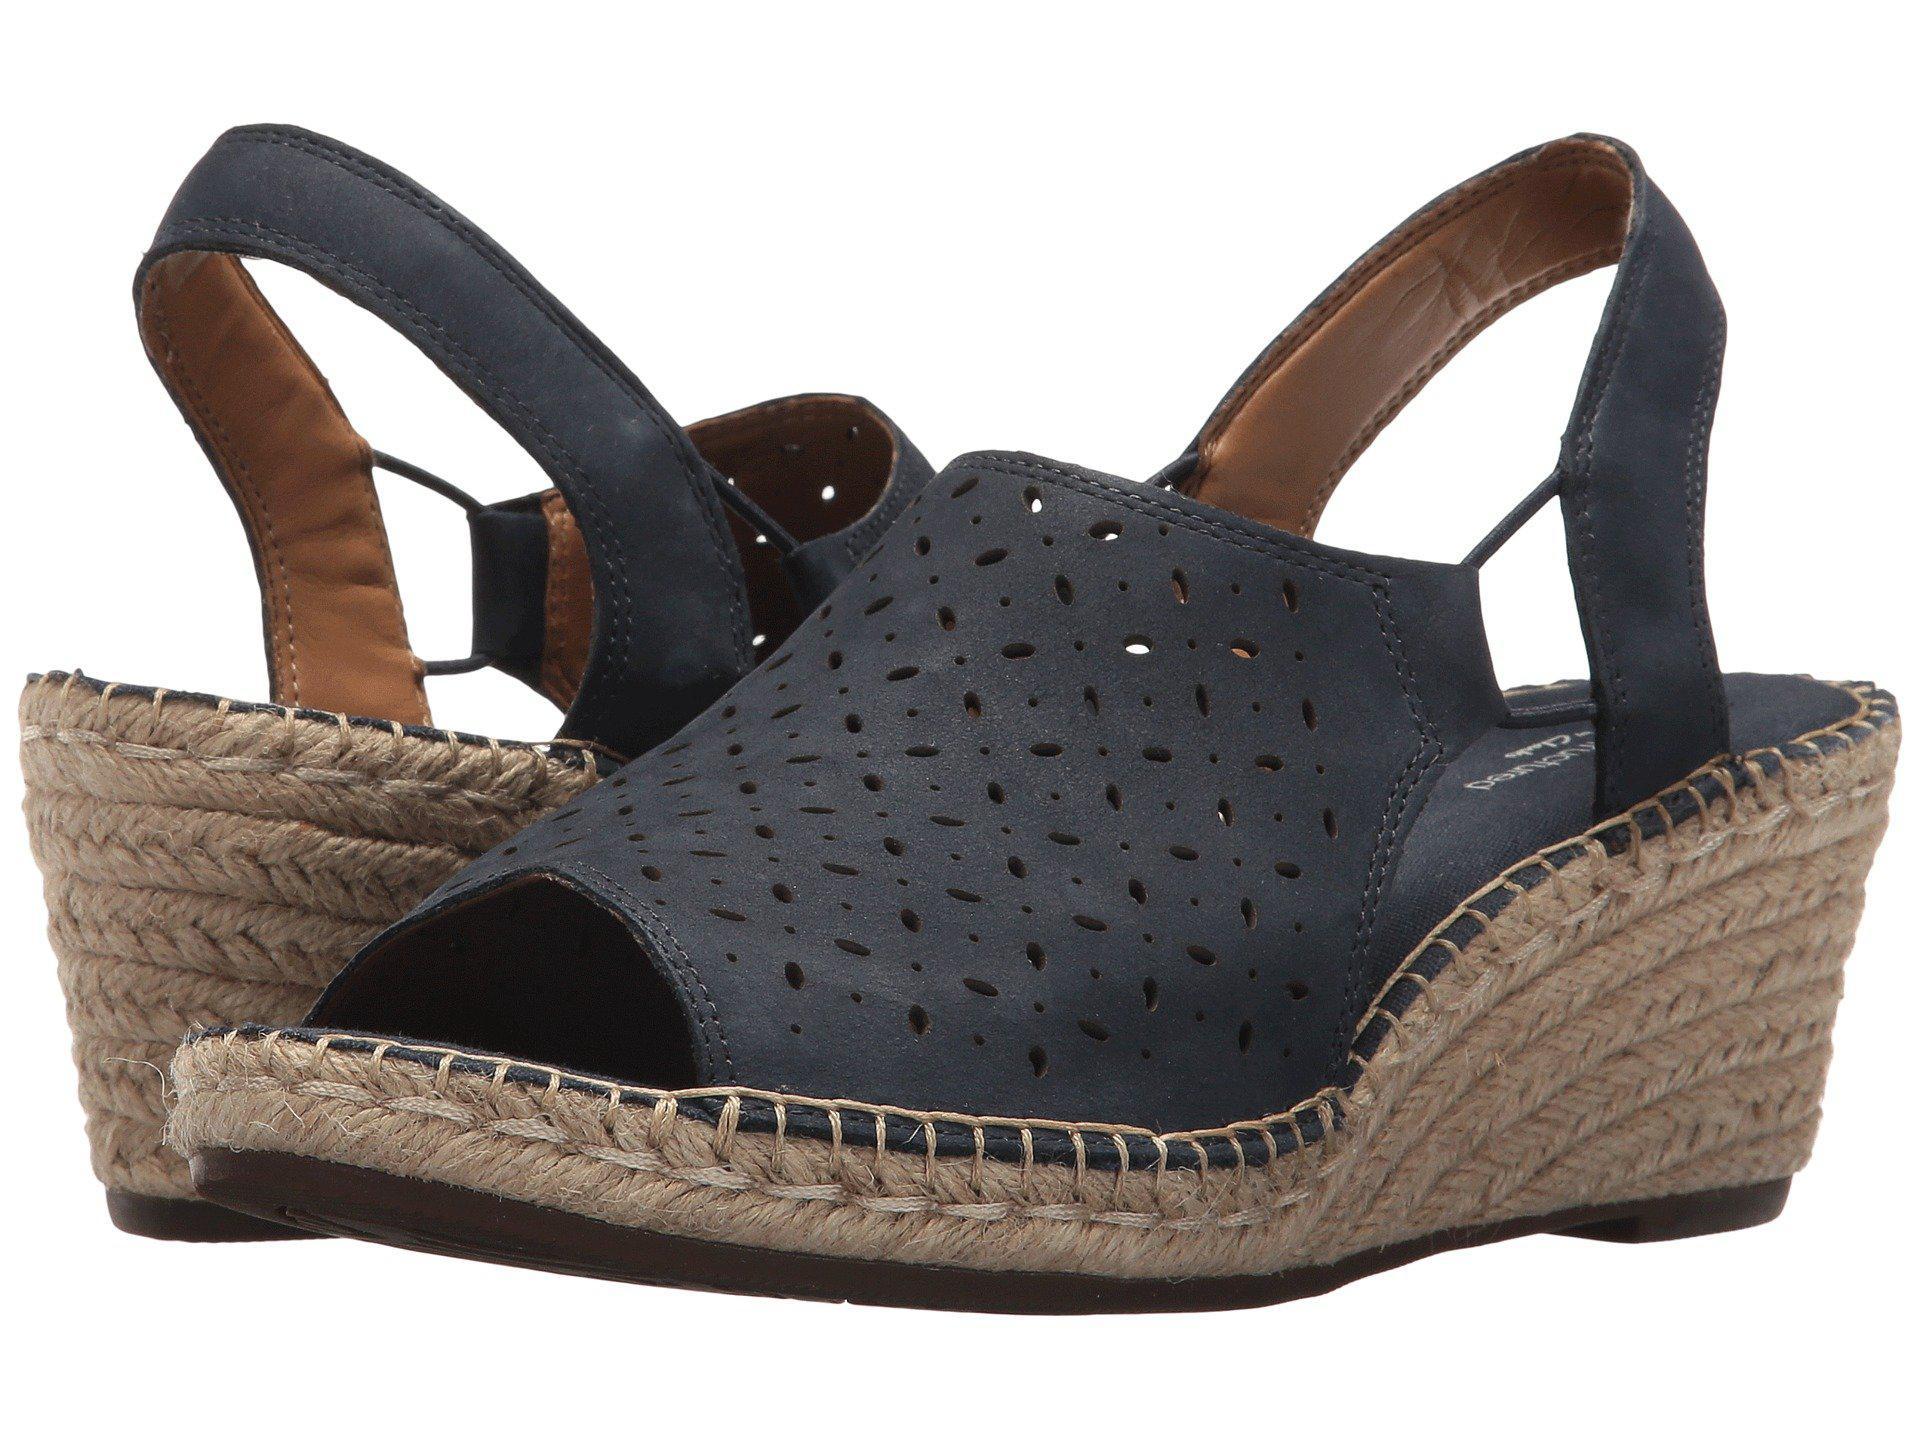 d99d6657769 Lyst - Clarks Petrina Gail (gold Metallic Leather) Women s Shoes in Blue